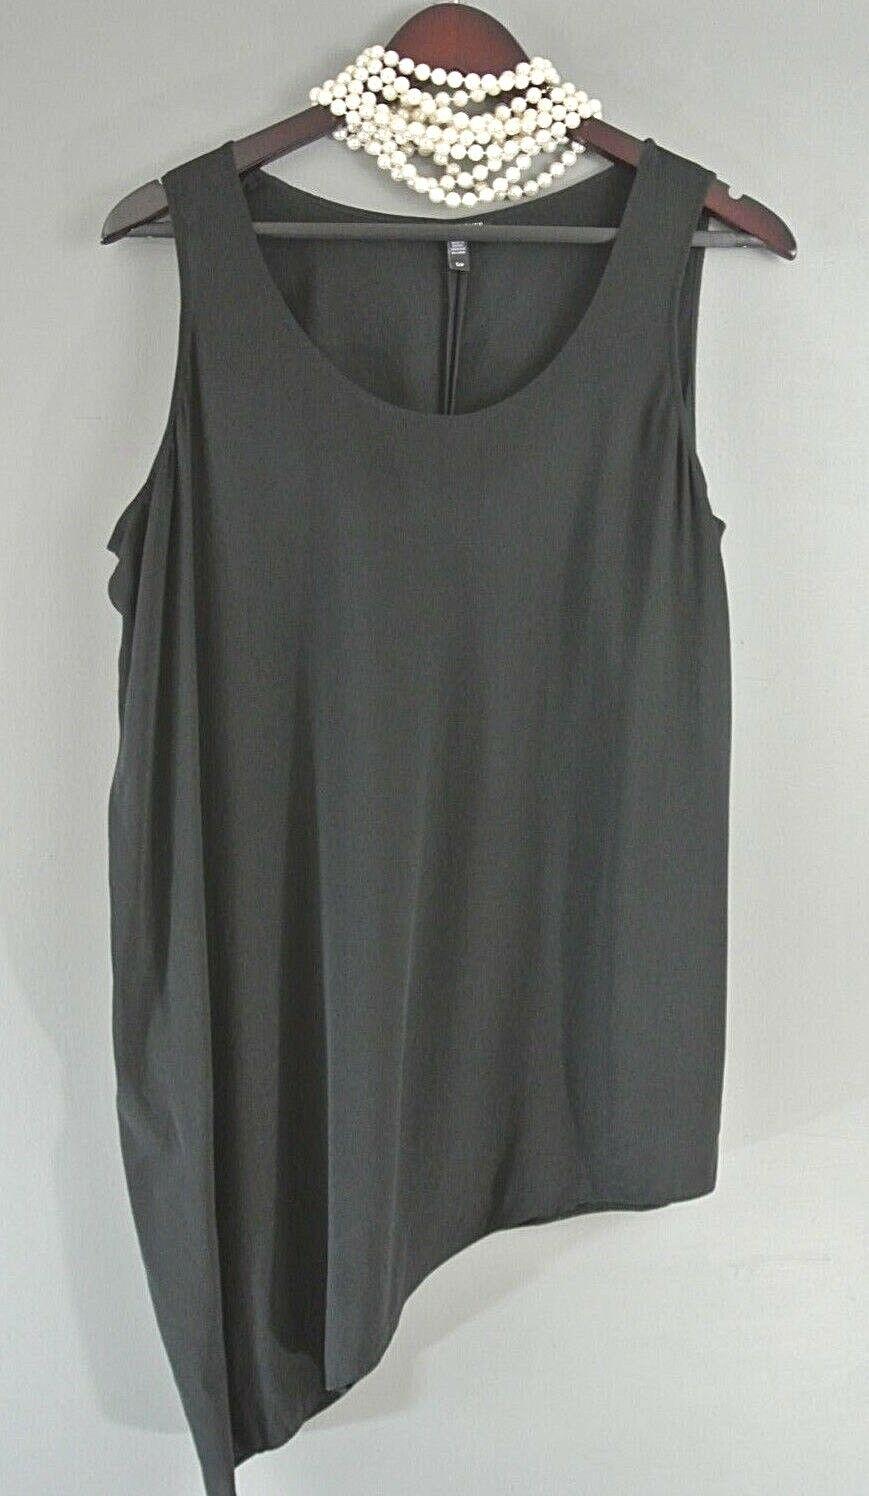 Eileen Fisher 100% Silk Sleeveless Blouse S P schwarz Asymmetrical Tank Top